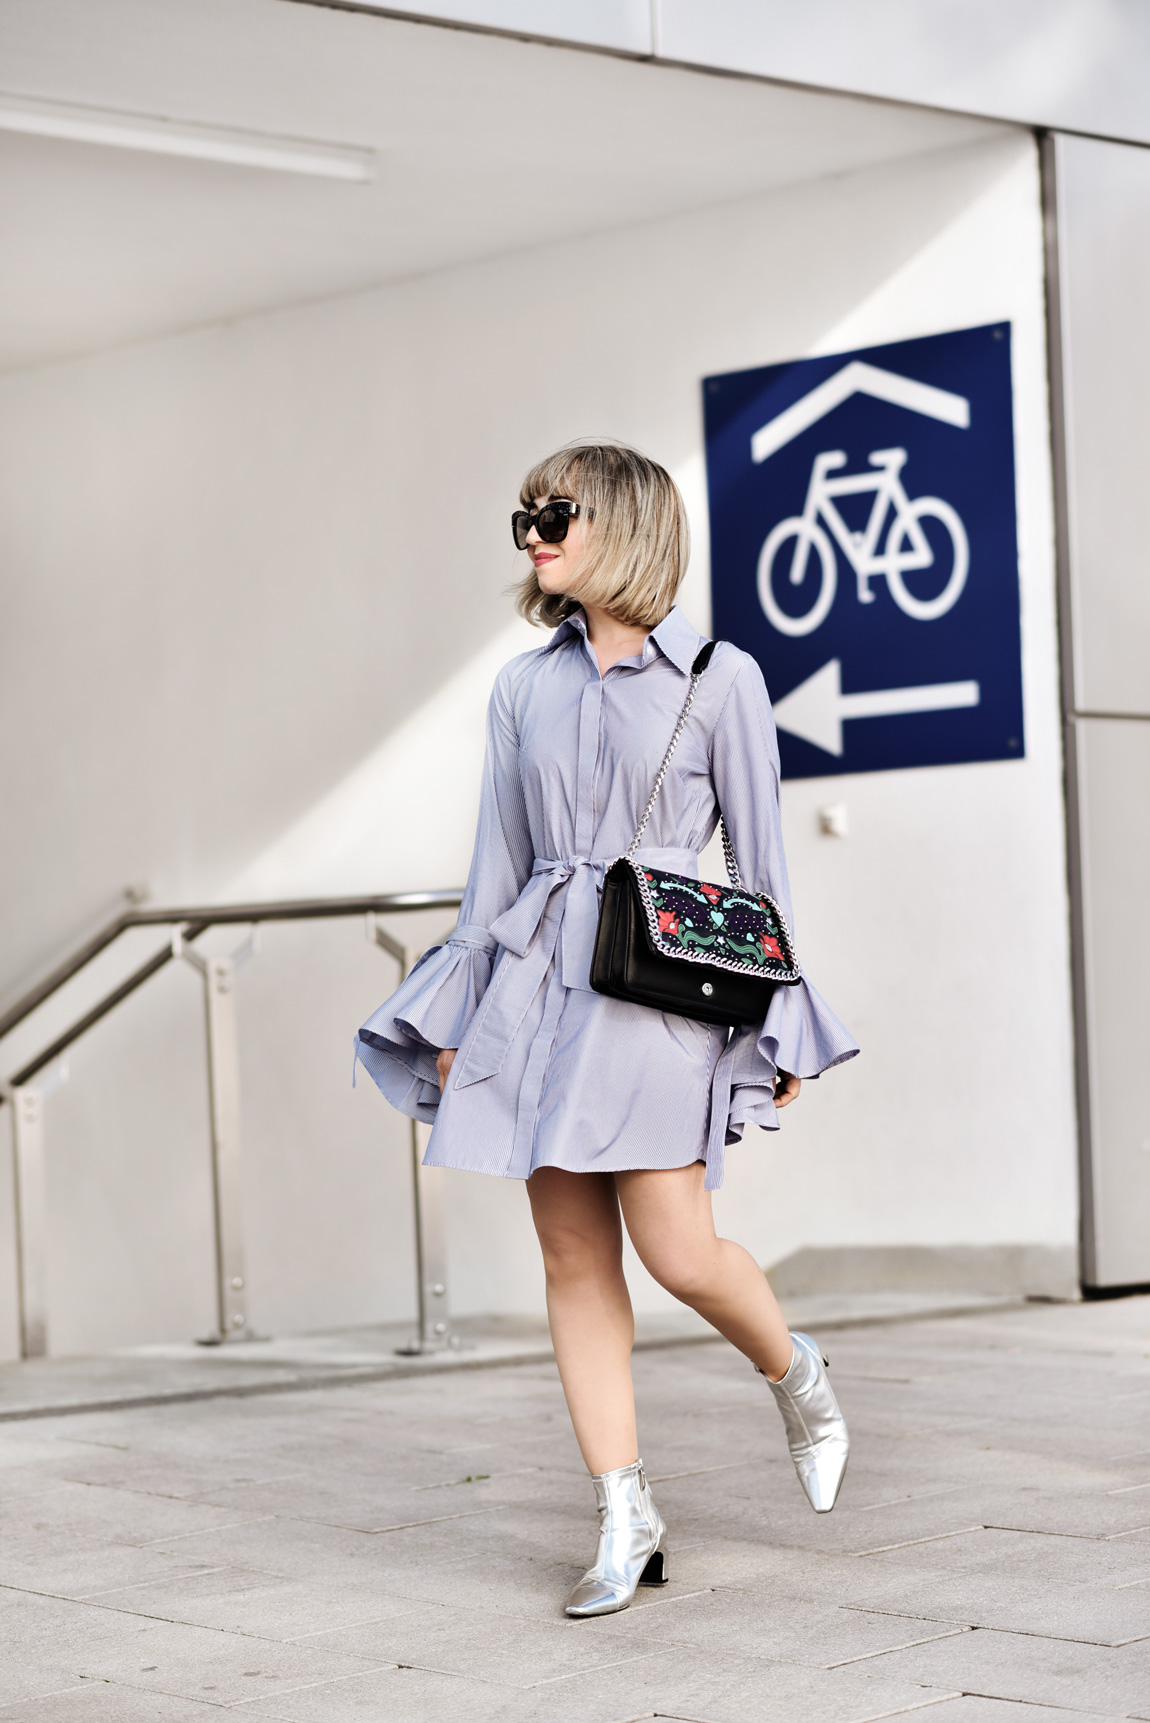 trompetenaermel, glockenaermel, volant, rueschen, kleid, fashionblogger, modeblogger, muenchen, styleblogger, streetstyle, sommer